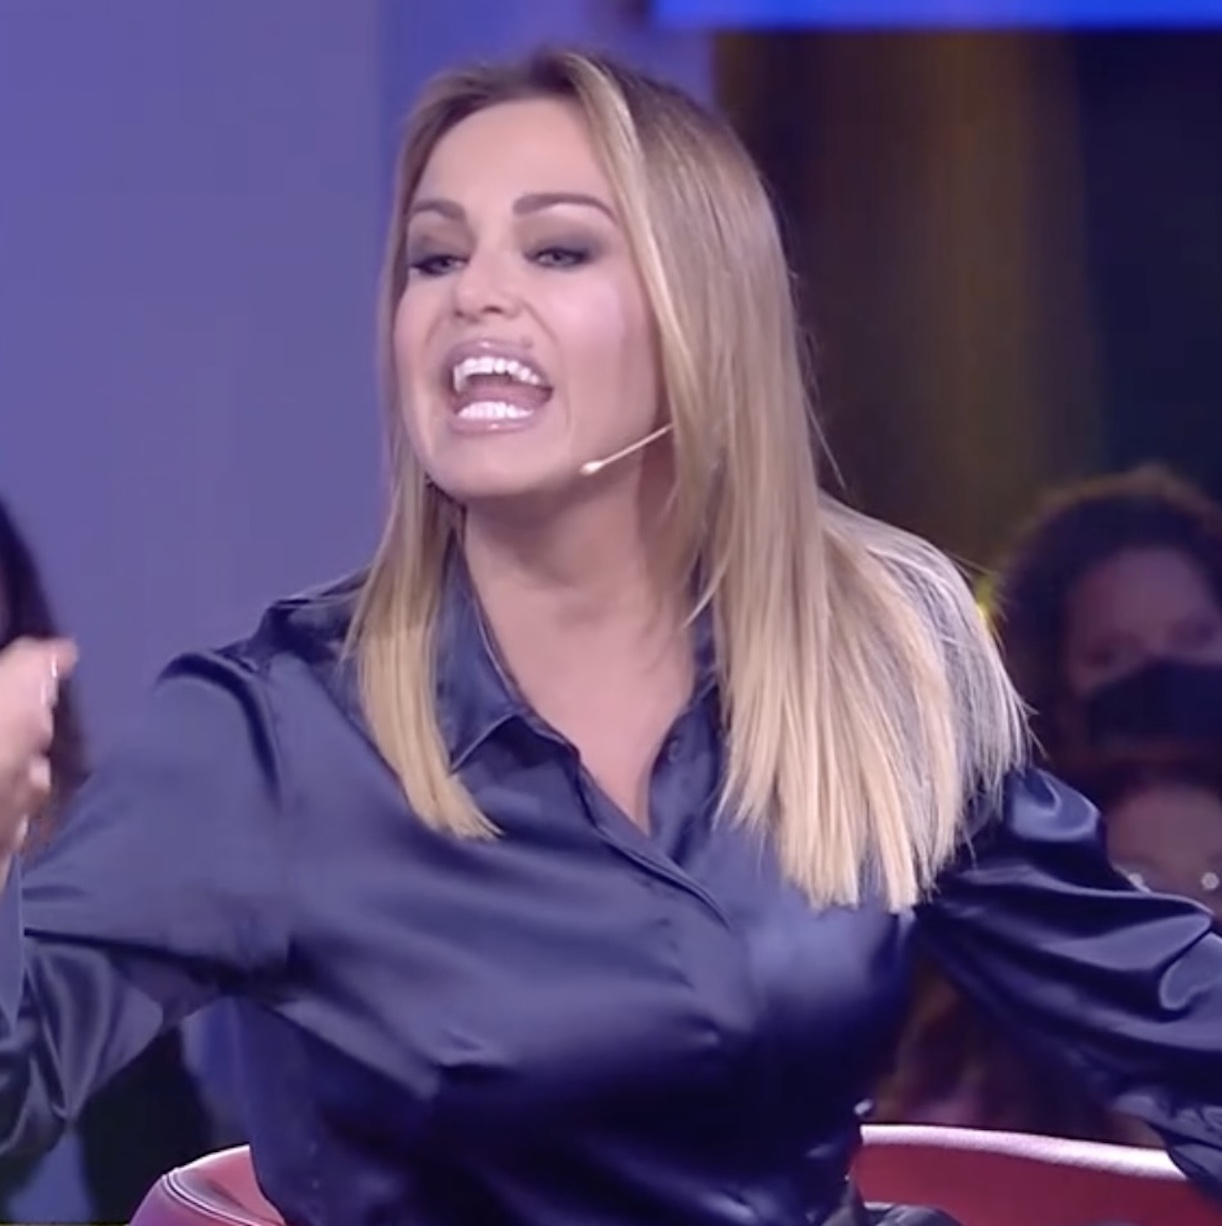 Adriana Volpe aereo sonia bruganelli